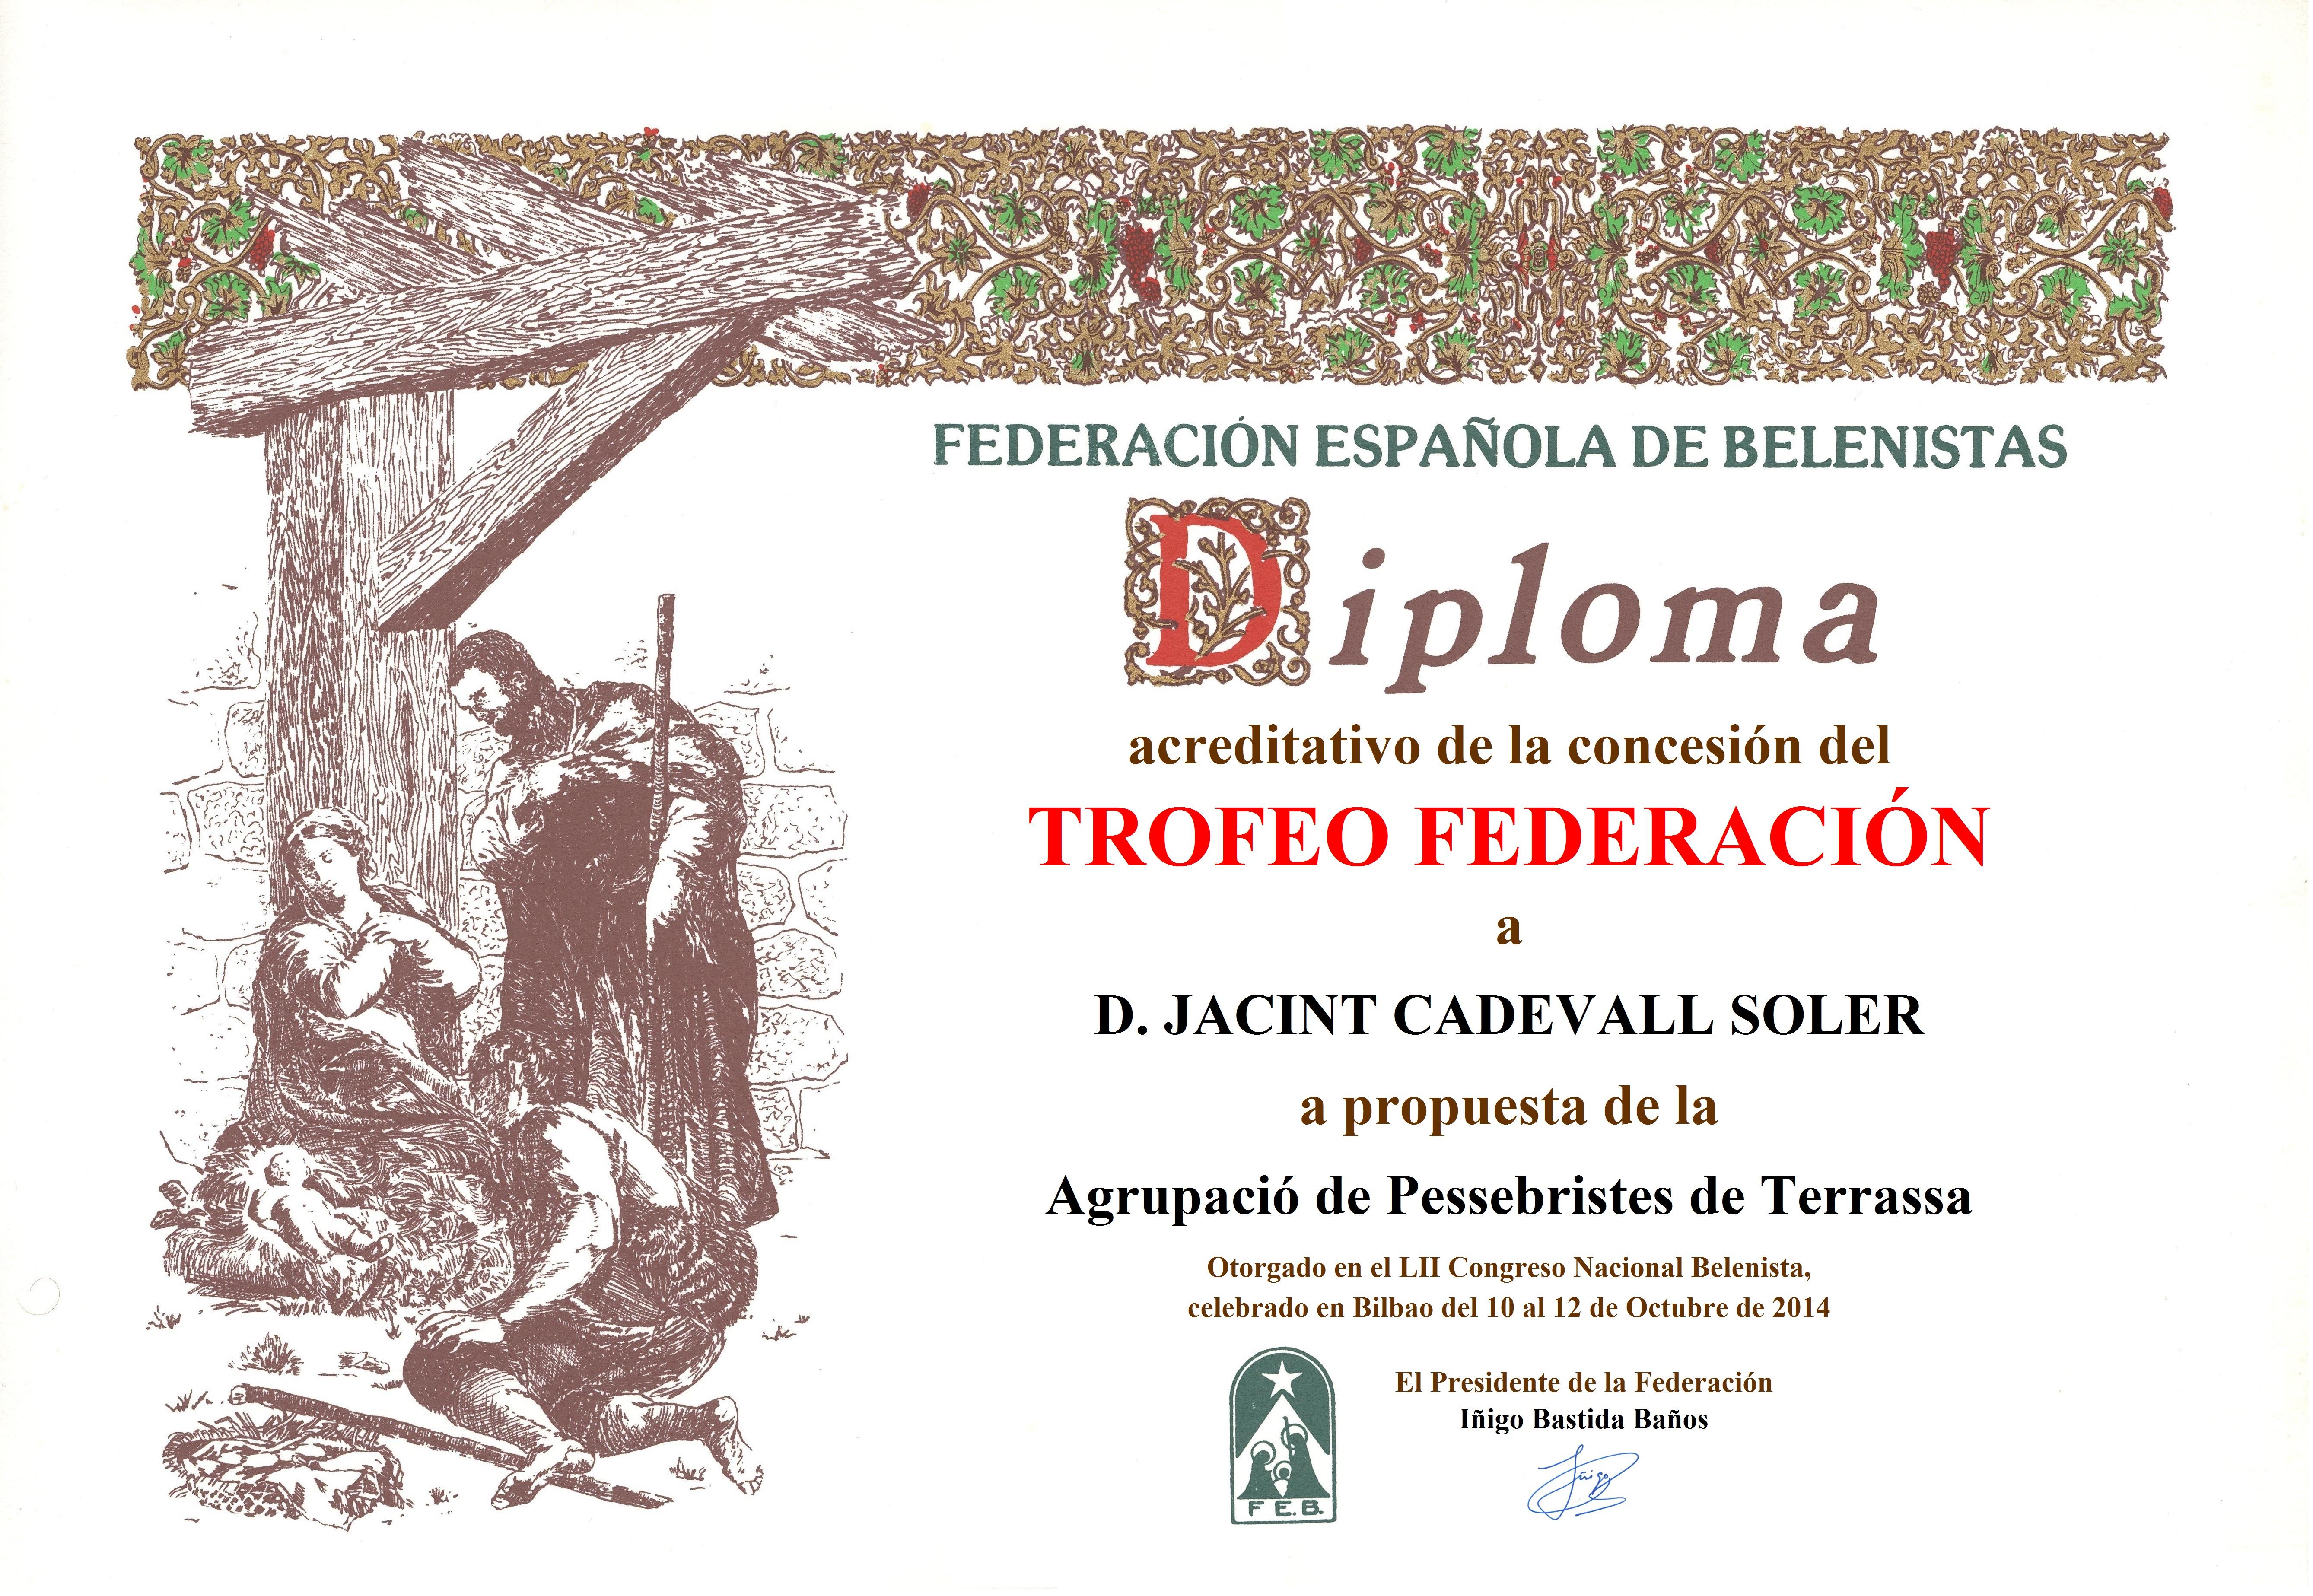 Diploma Trofeo FEB 2014 Jacint Cadevall Soler